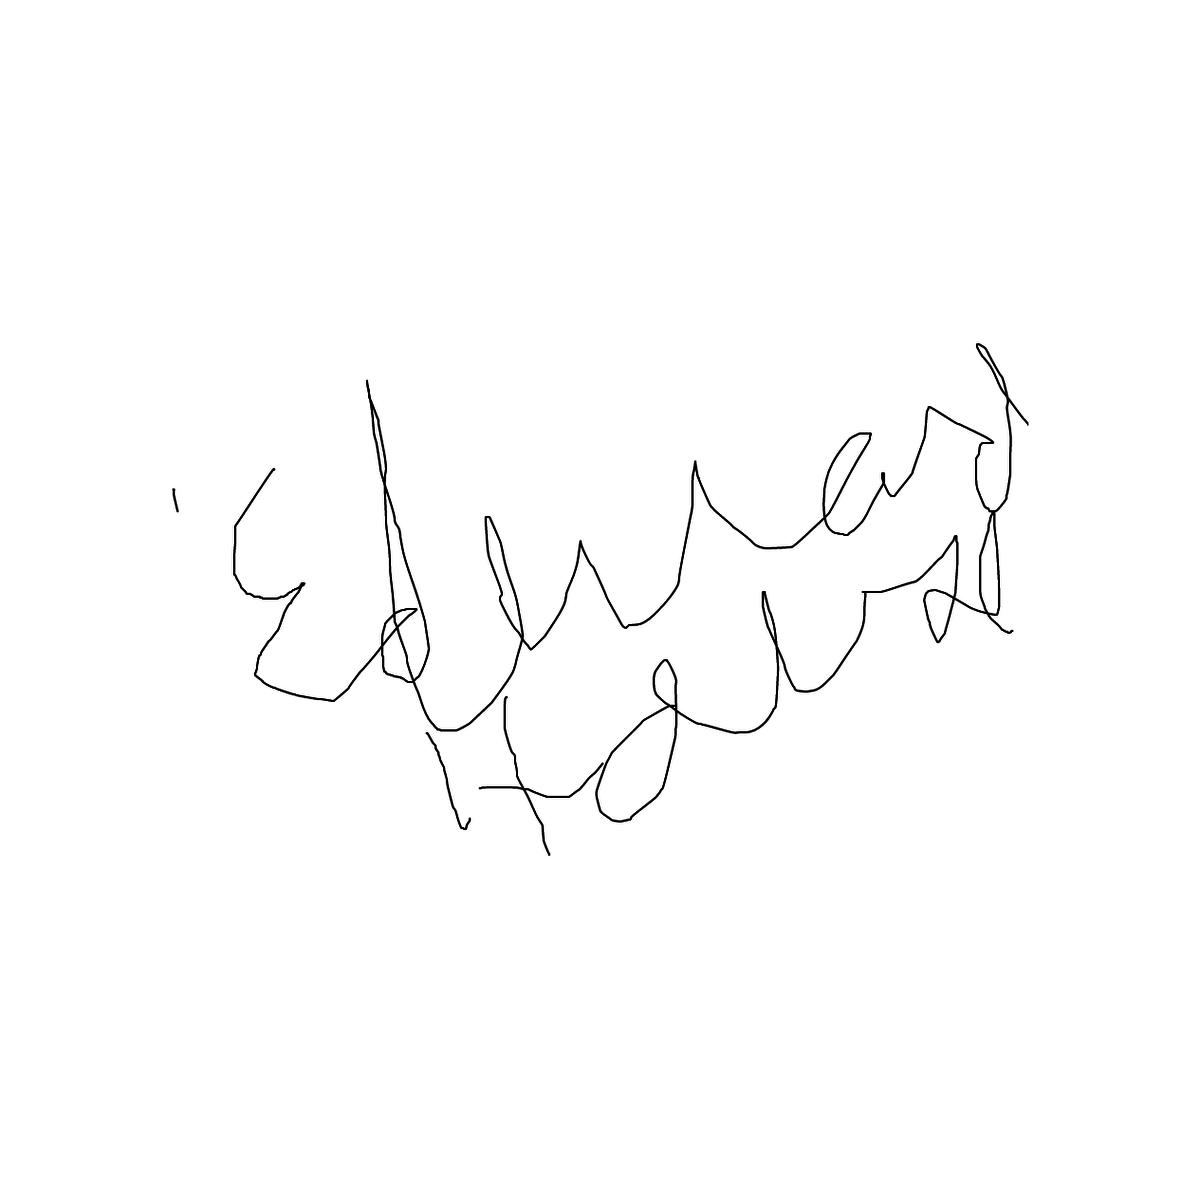 BAAAM drawing#6640 lat:51.0806655883789060lng: -114.1708068847656200